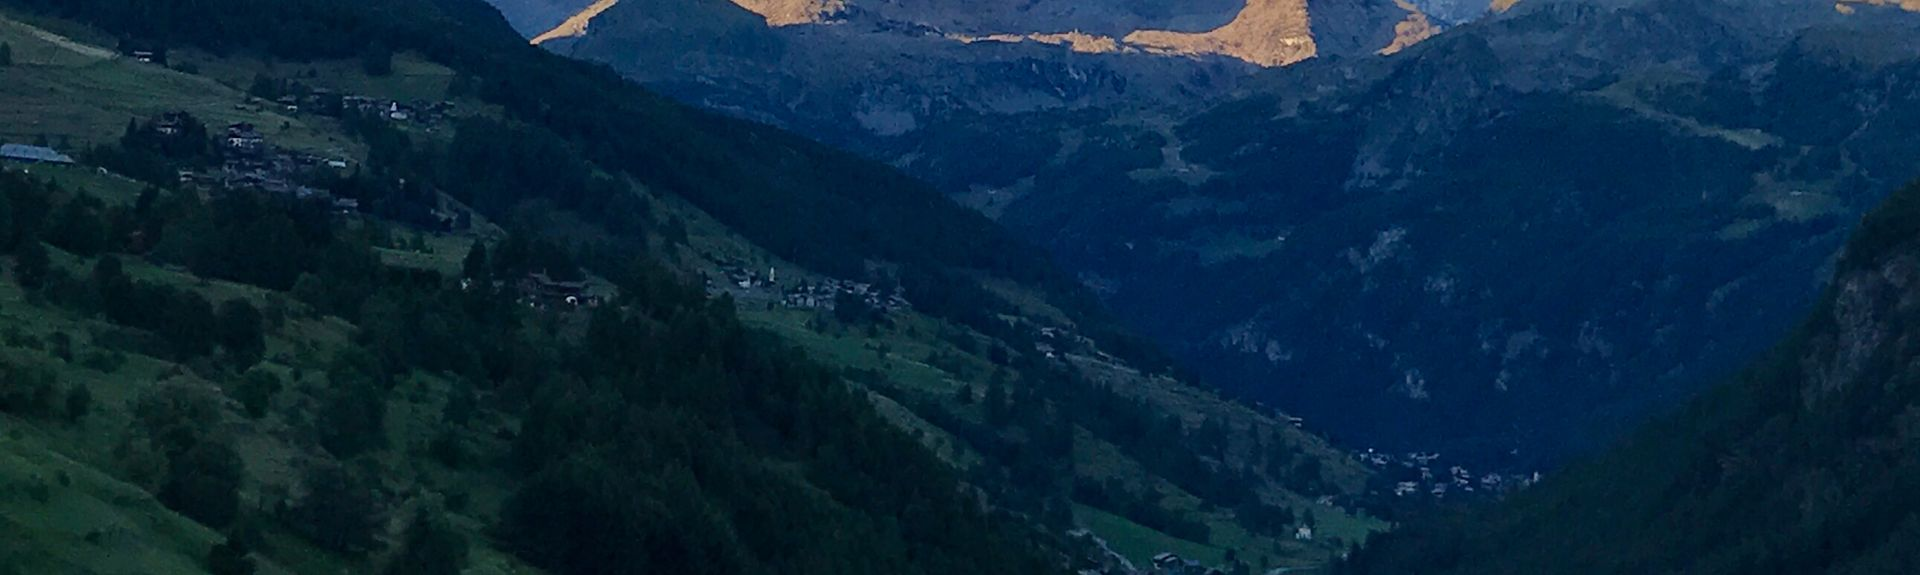 Riva Valdobbia, Alagna Valsesia, Piemonte, Italia